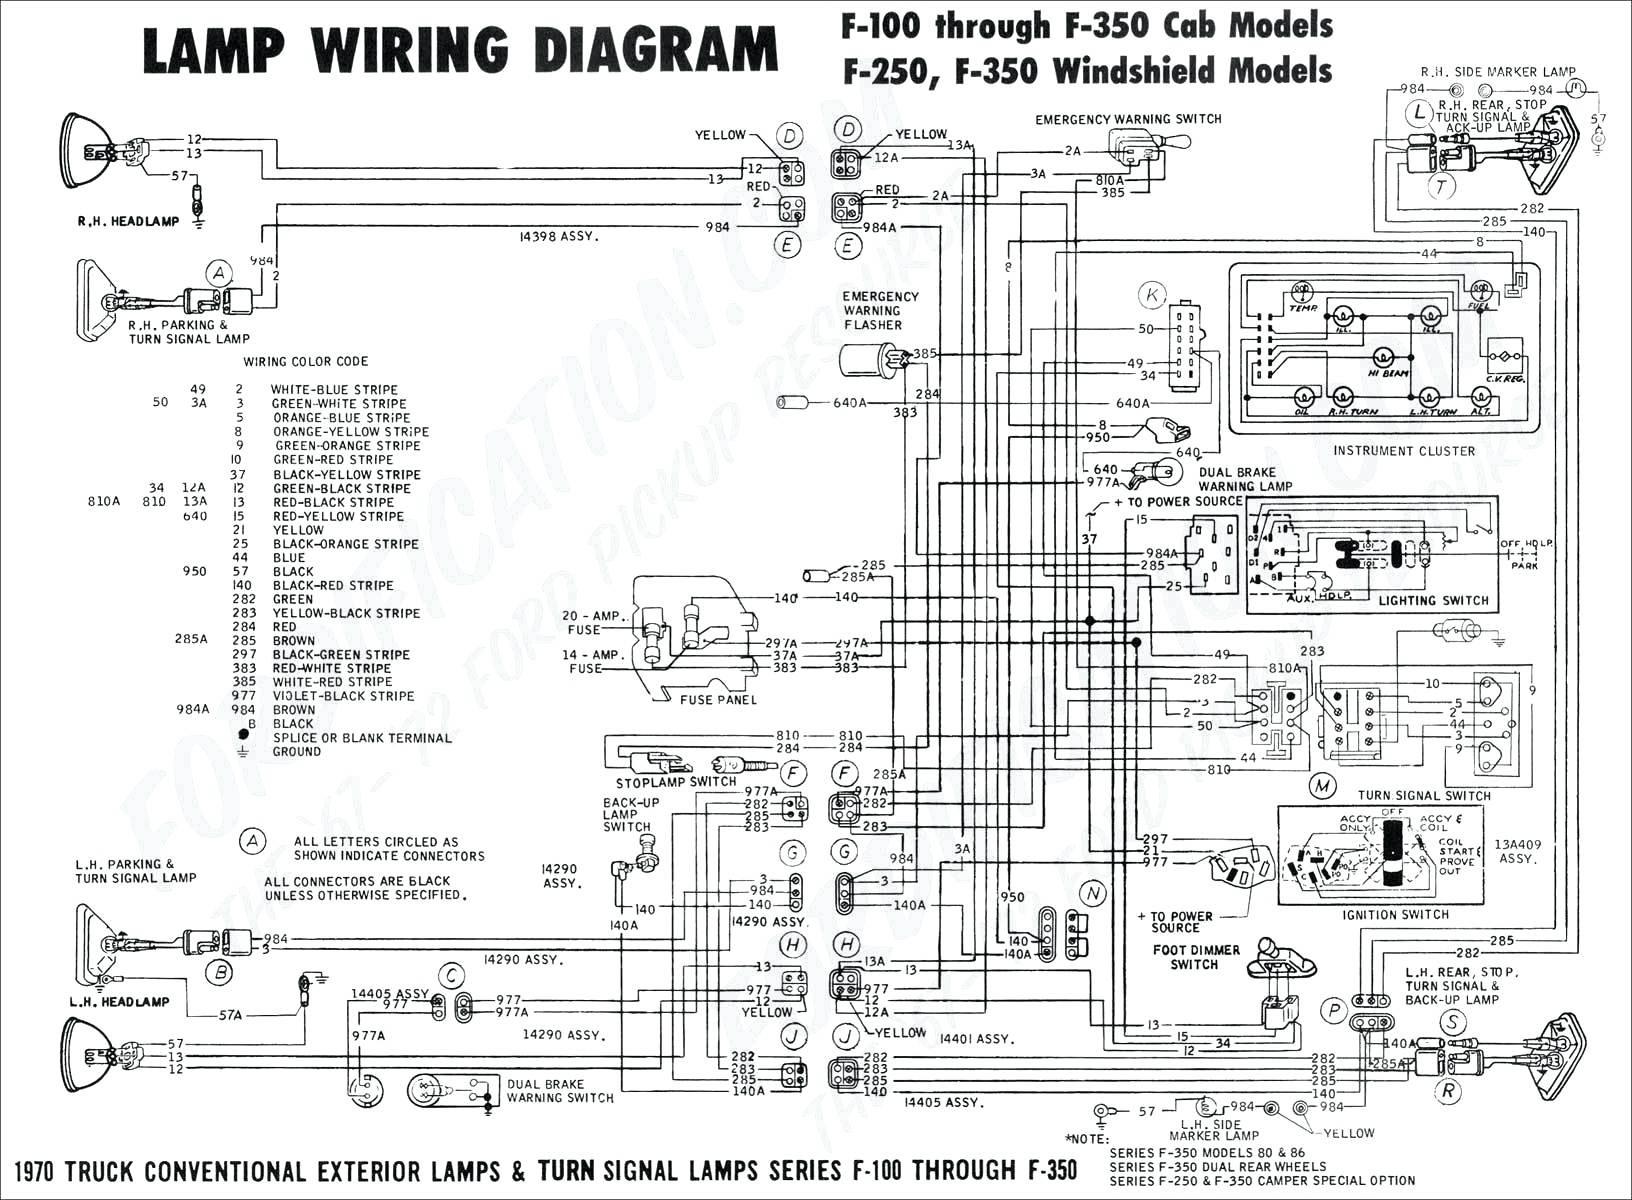 hight resolution of saturn sl1 vacuum line diagram lzk gallery schematic wiring diagram u2022 rh aerofitness co 1959 chevy elegant 2001 oldsmobile alero radio wiring diagram